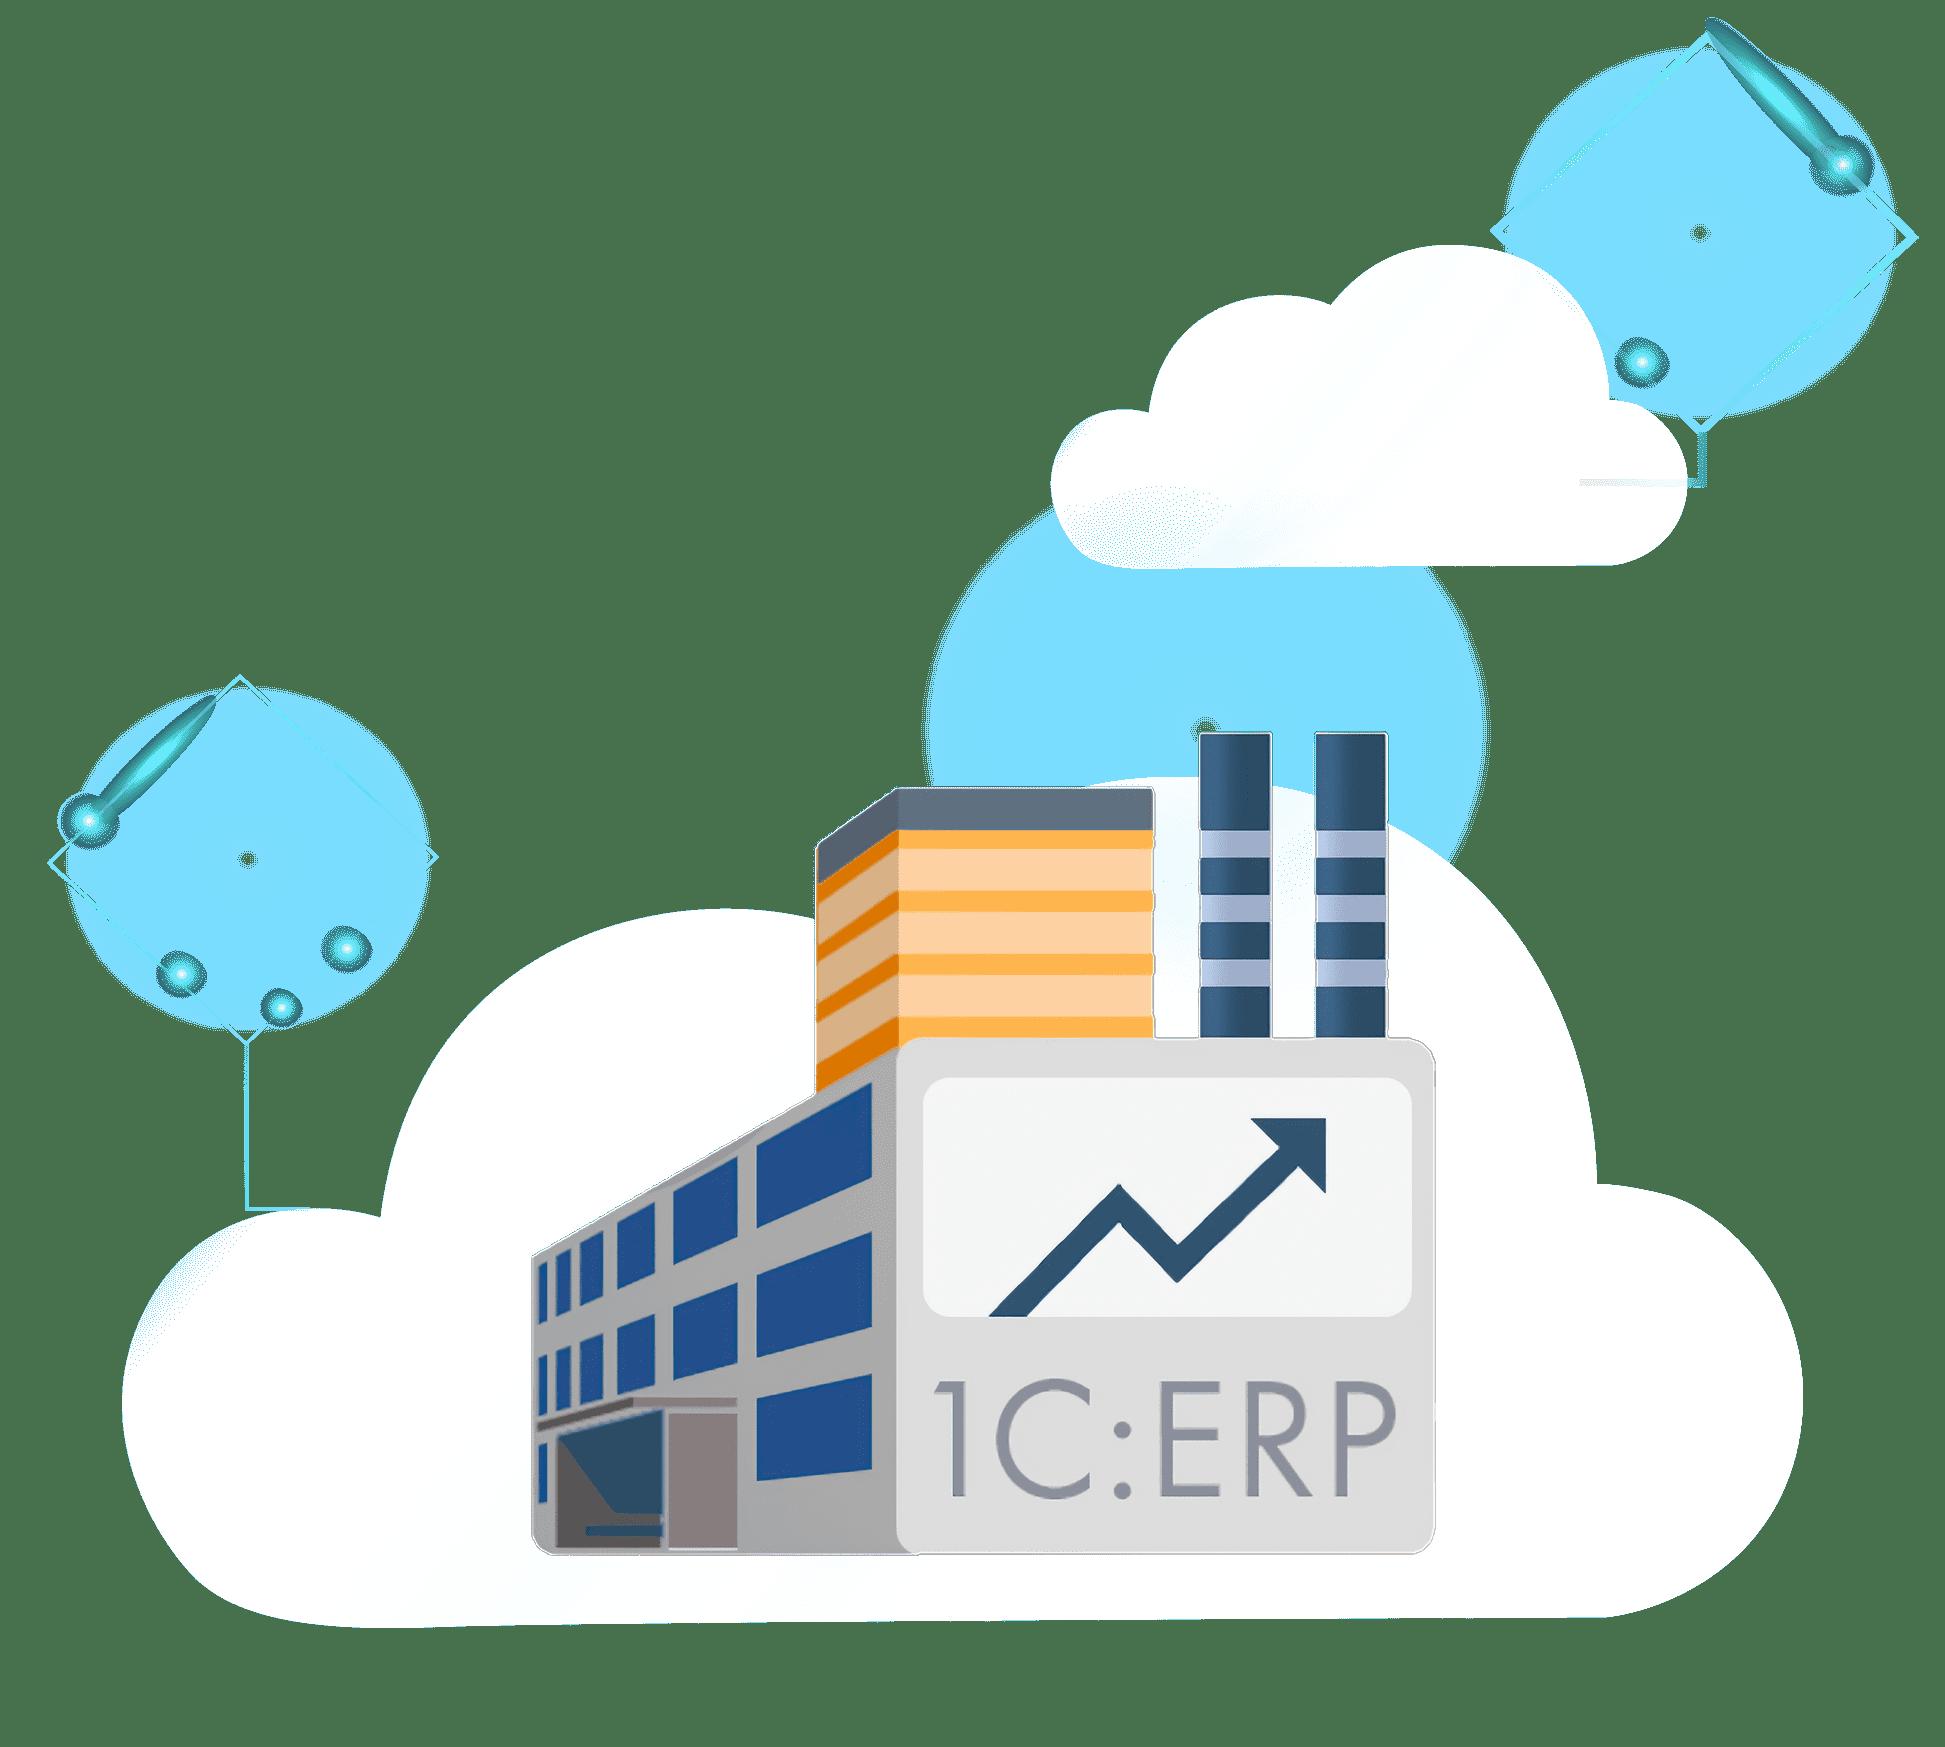 1С:ERP Управление предприятием в облаке